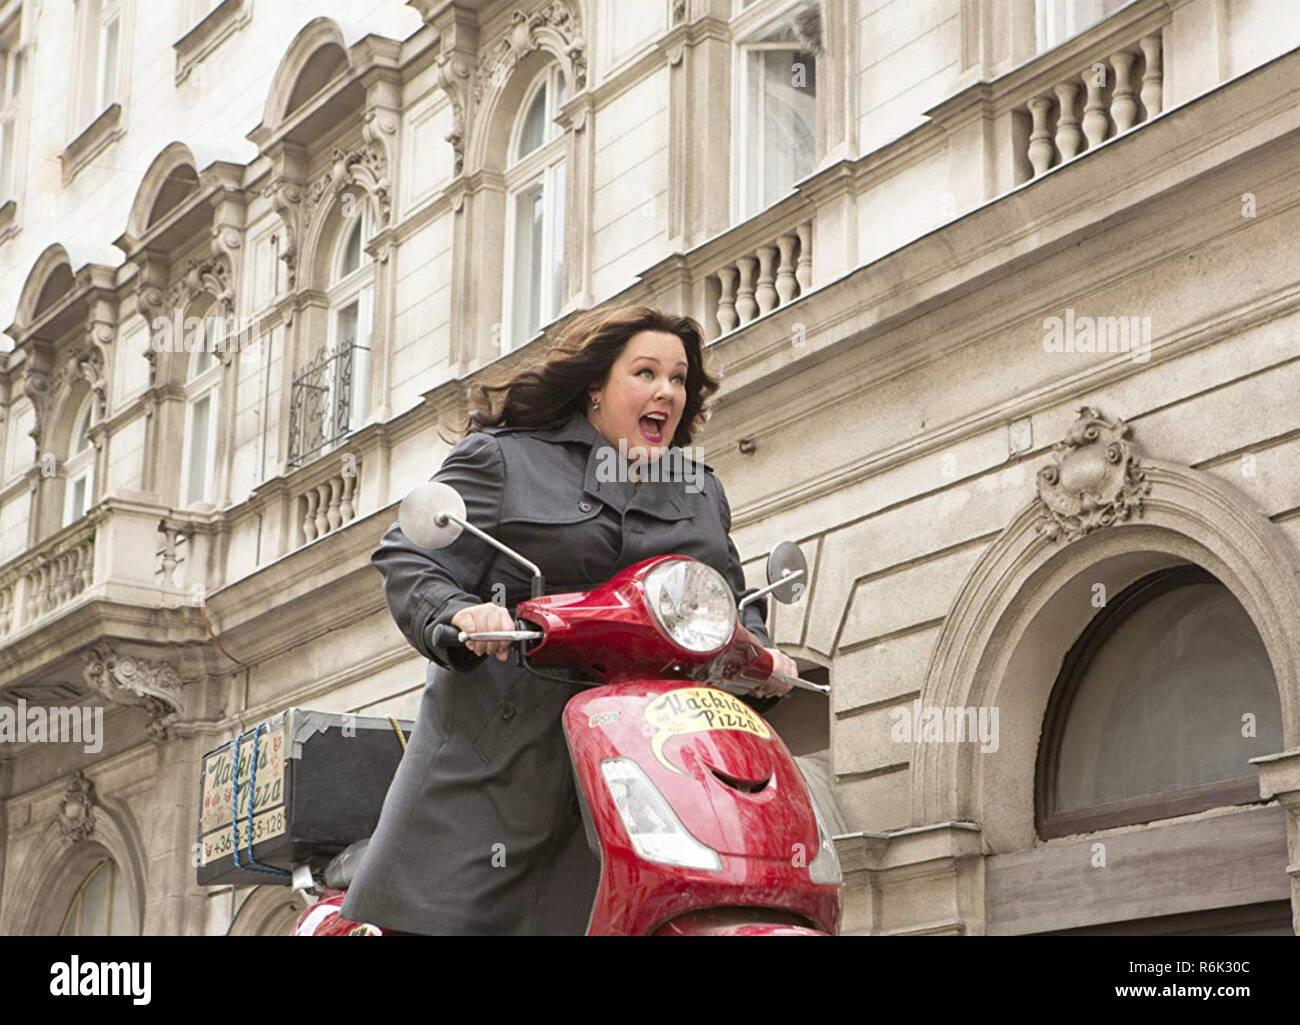 SPY 2015 20th Century Fox film with Melissa McCarthy - Stock Image